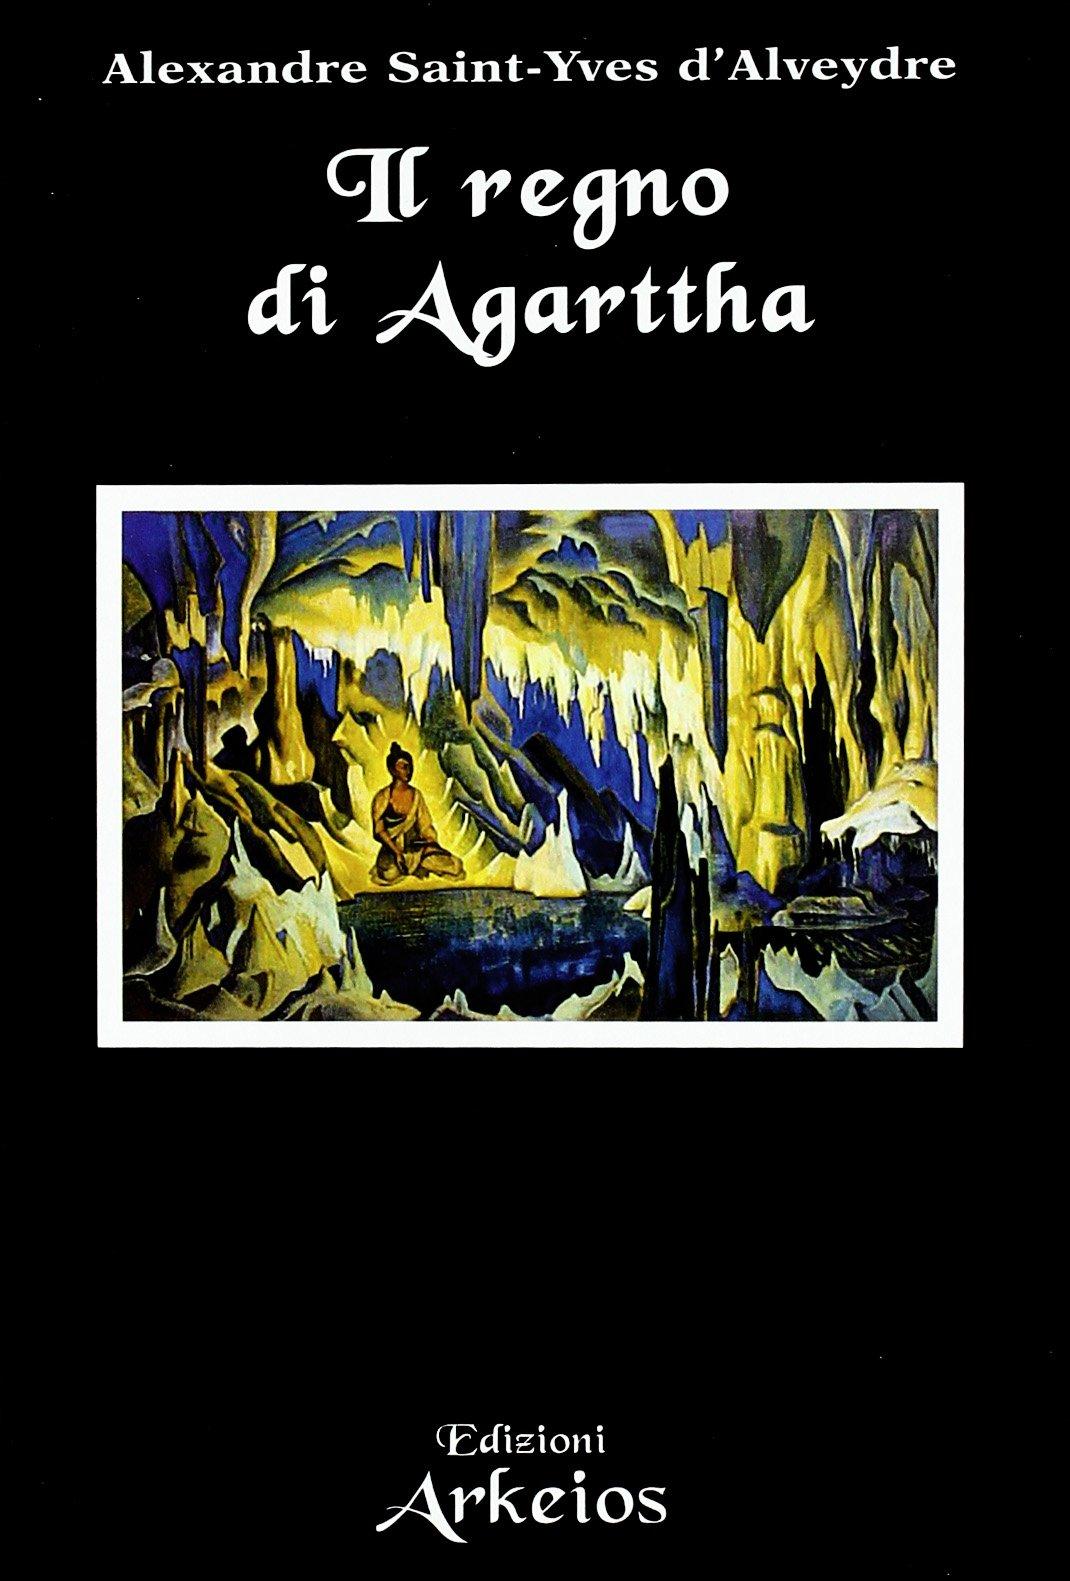 regno-agarttha-alexandre-saint-yves-dalveydre